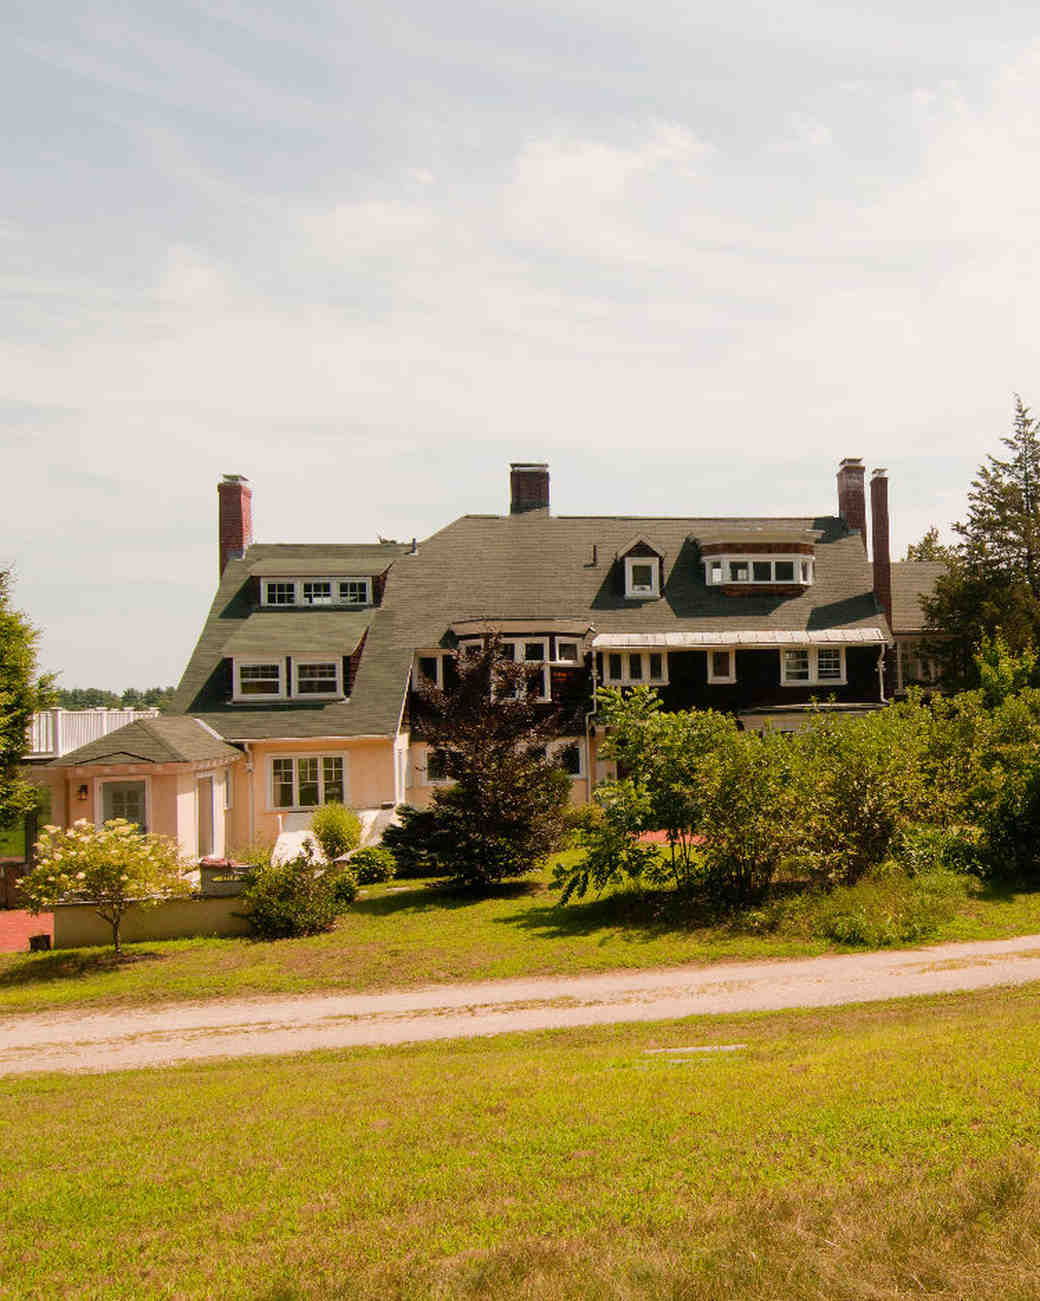 airbnb-wedding-venues-concord-massachusetts-0515.jpg